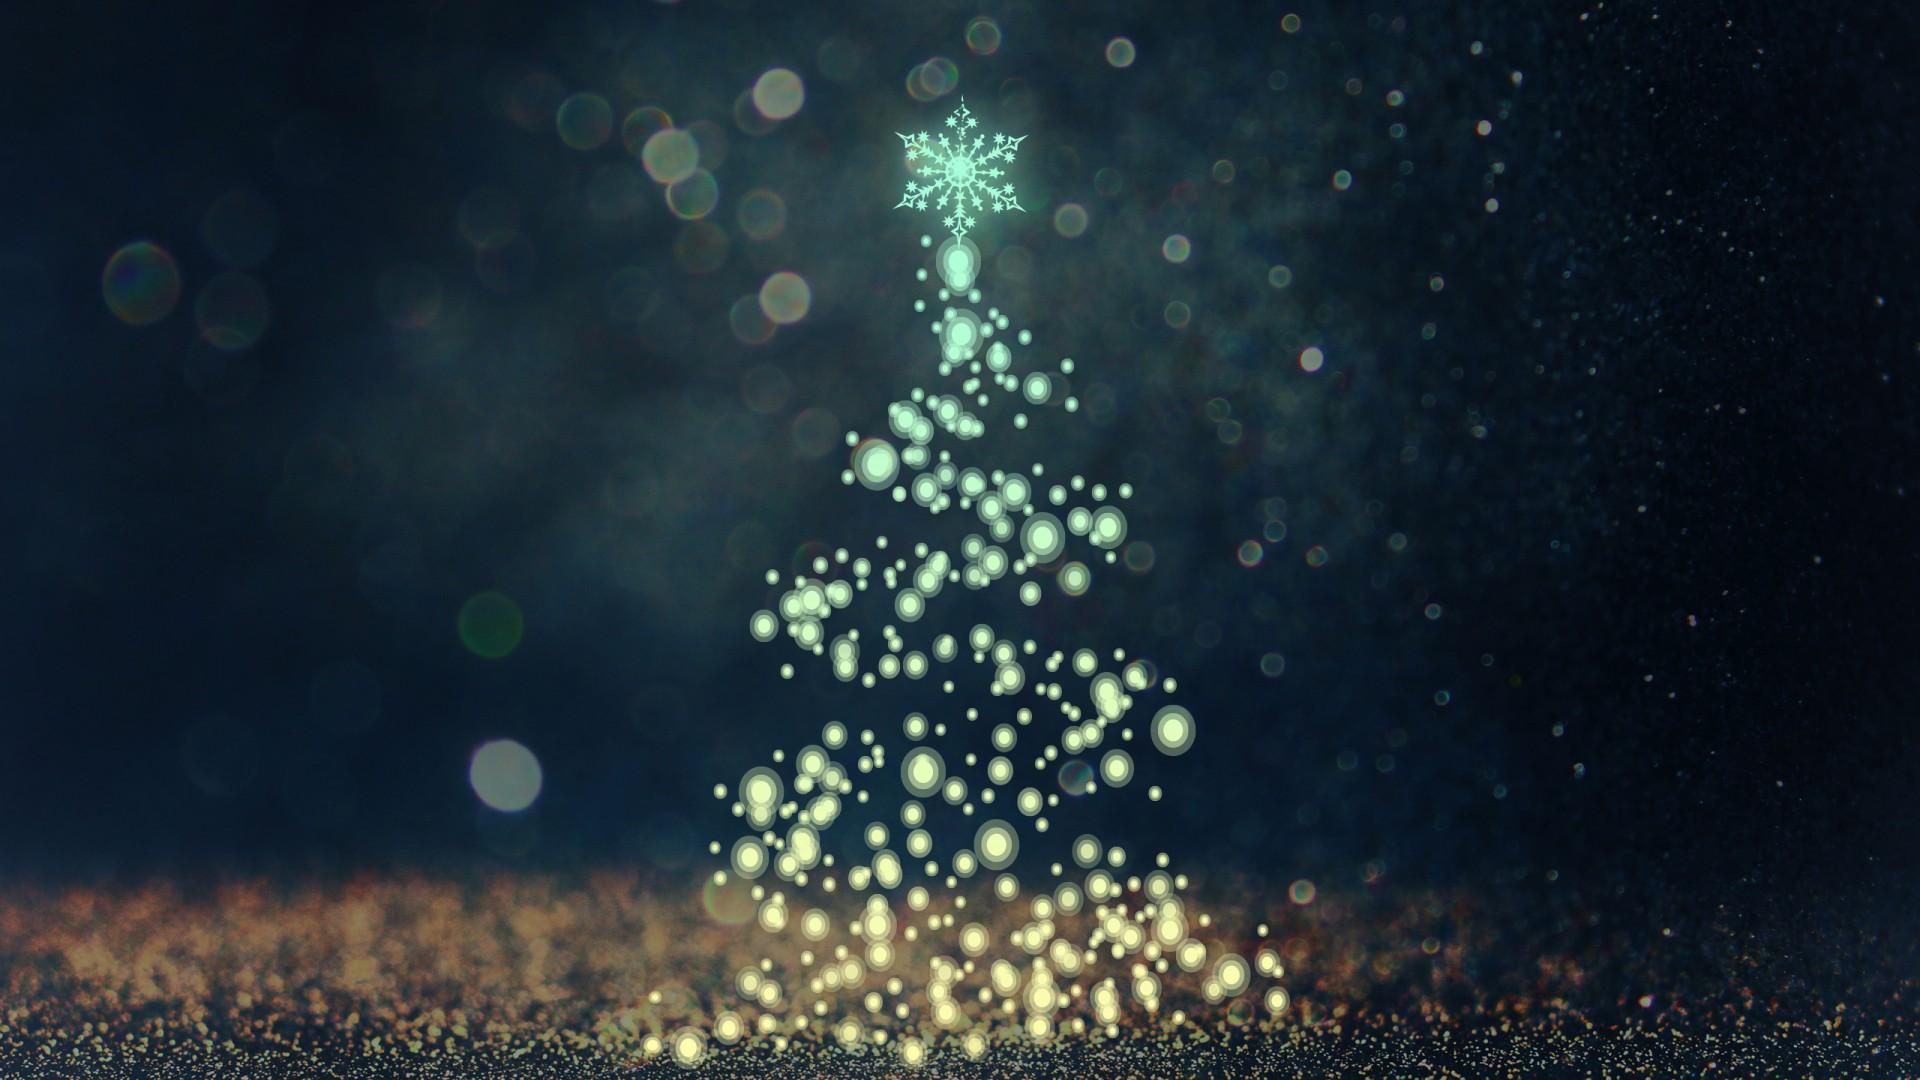 Cute Beach Desktop Wallpaper Christmas Tree Bokeh Wallpapers Hd Wallpapers Id 19271